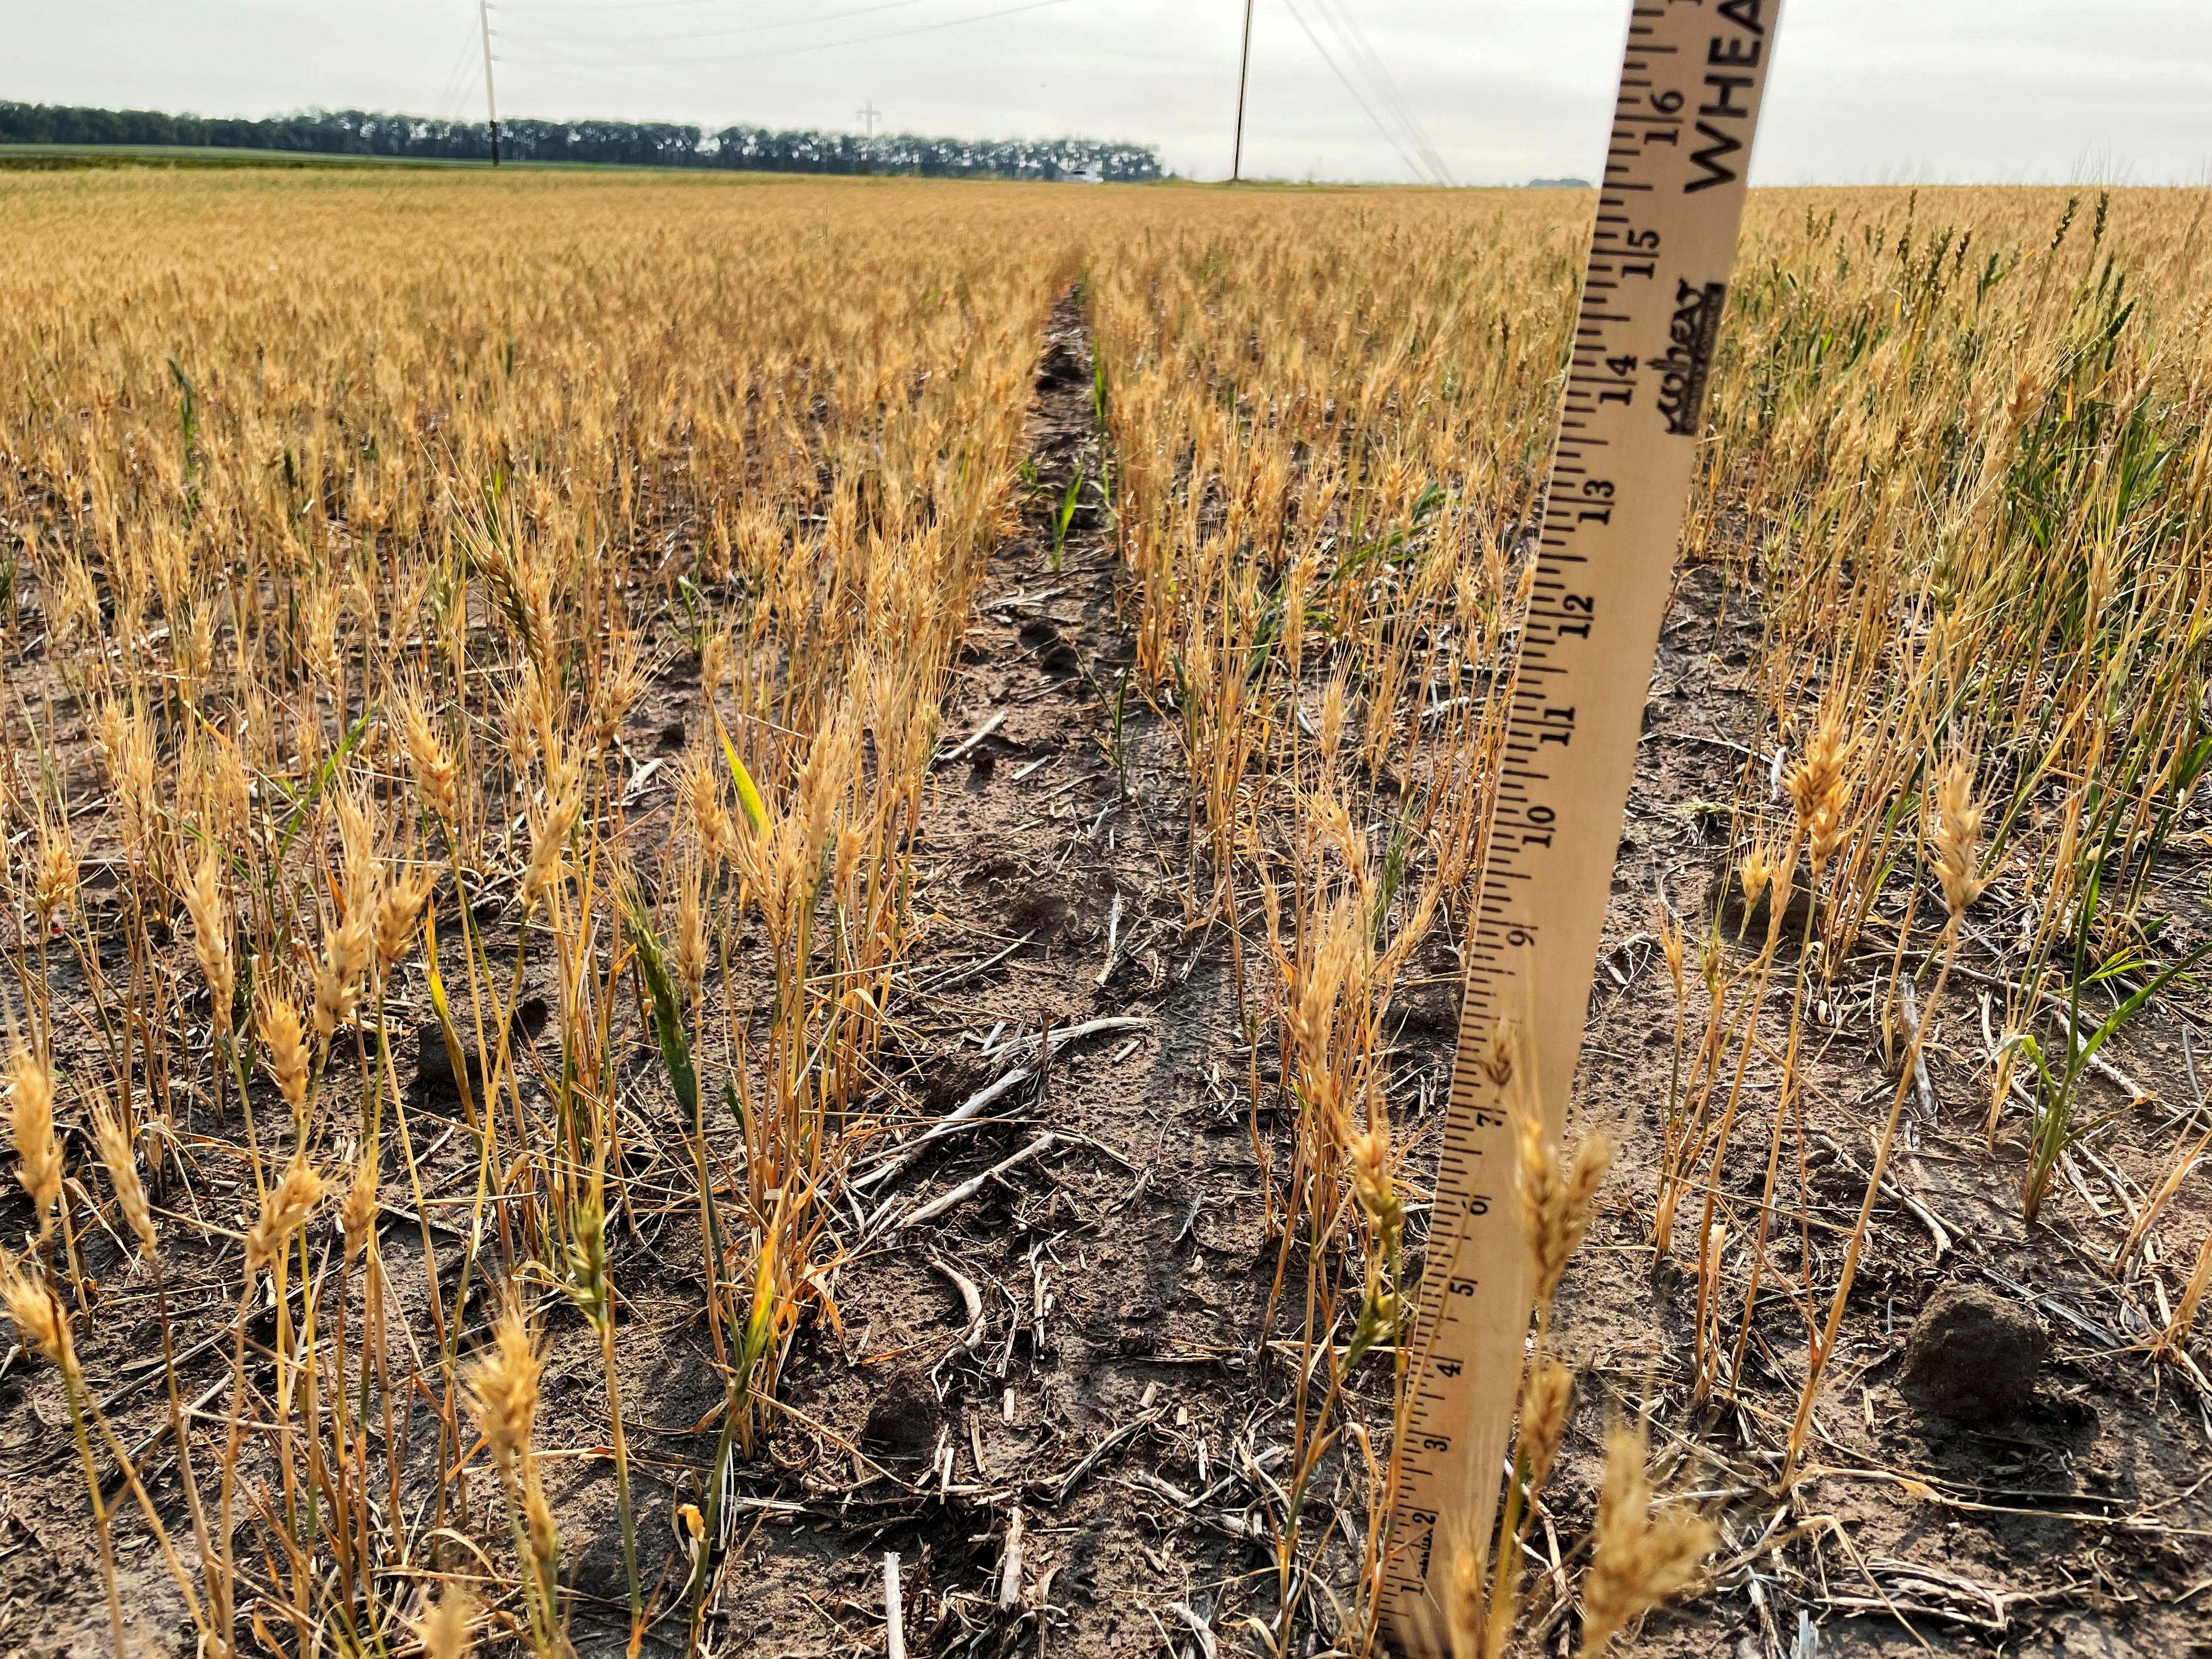 Spring wheat plants stunted by drought stress near Larimore, North Dakota, U.S. July 29, 2021.  REUTERS/Karl Plume